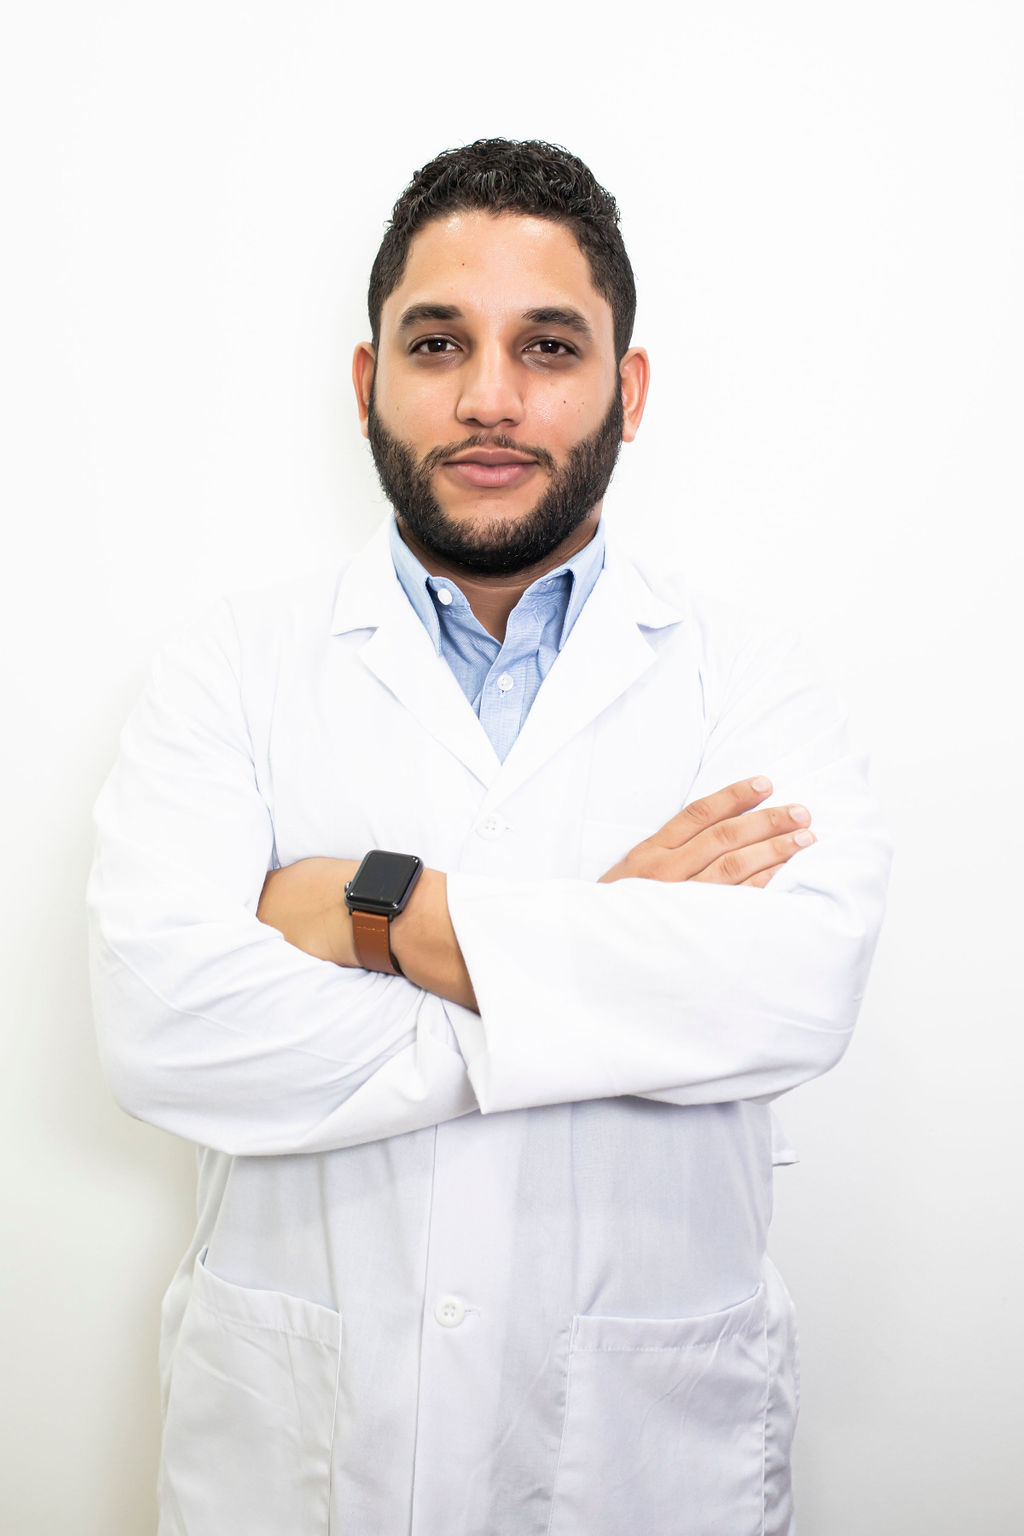 Dr. Samuel Madera